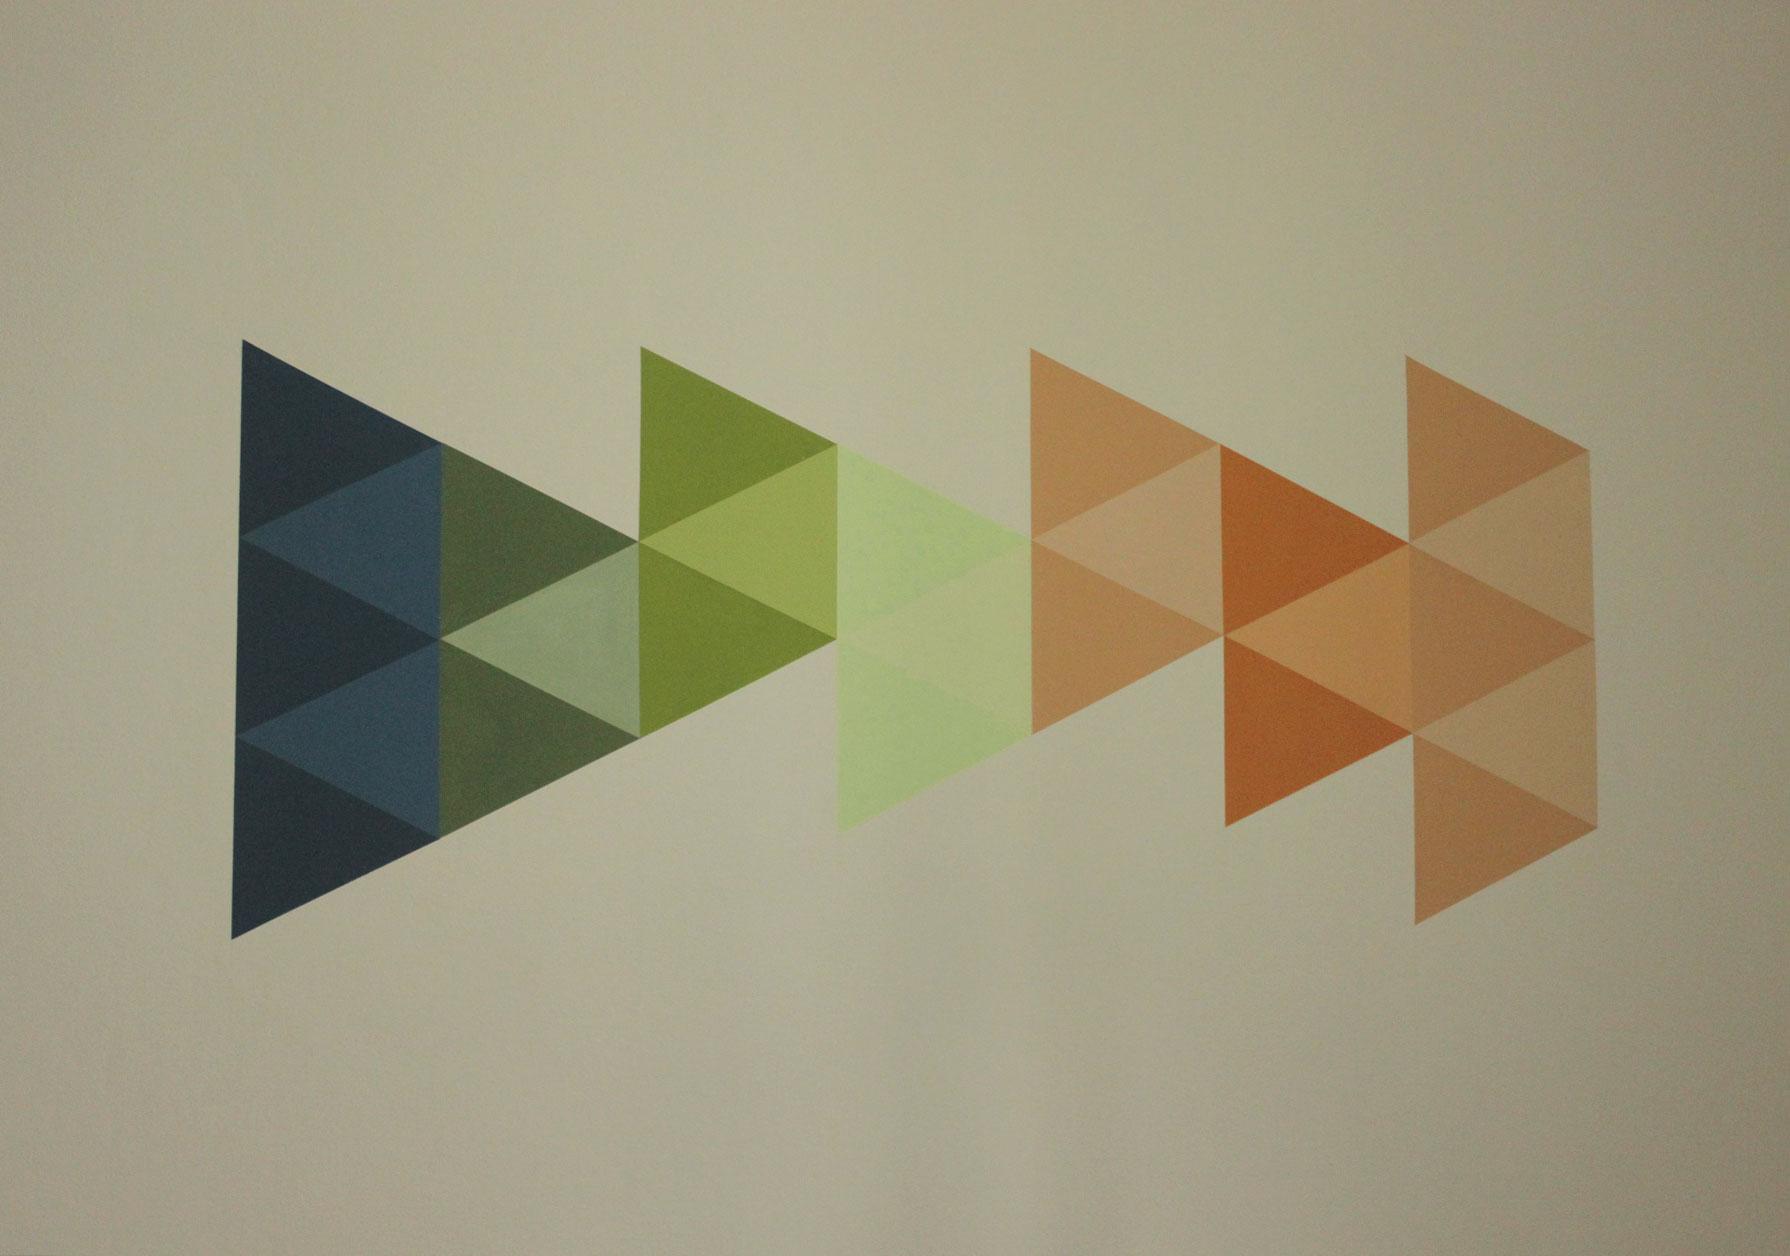 resultado-parede-pintada-decorada-triangulos